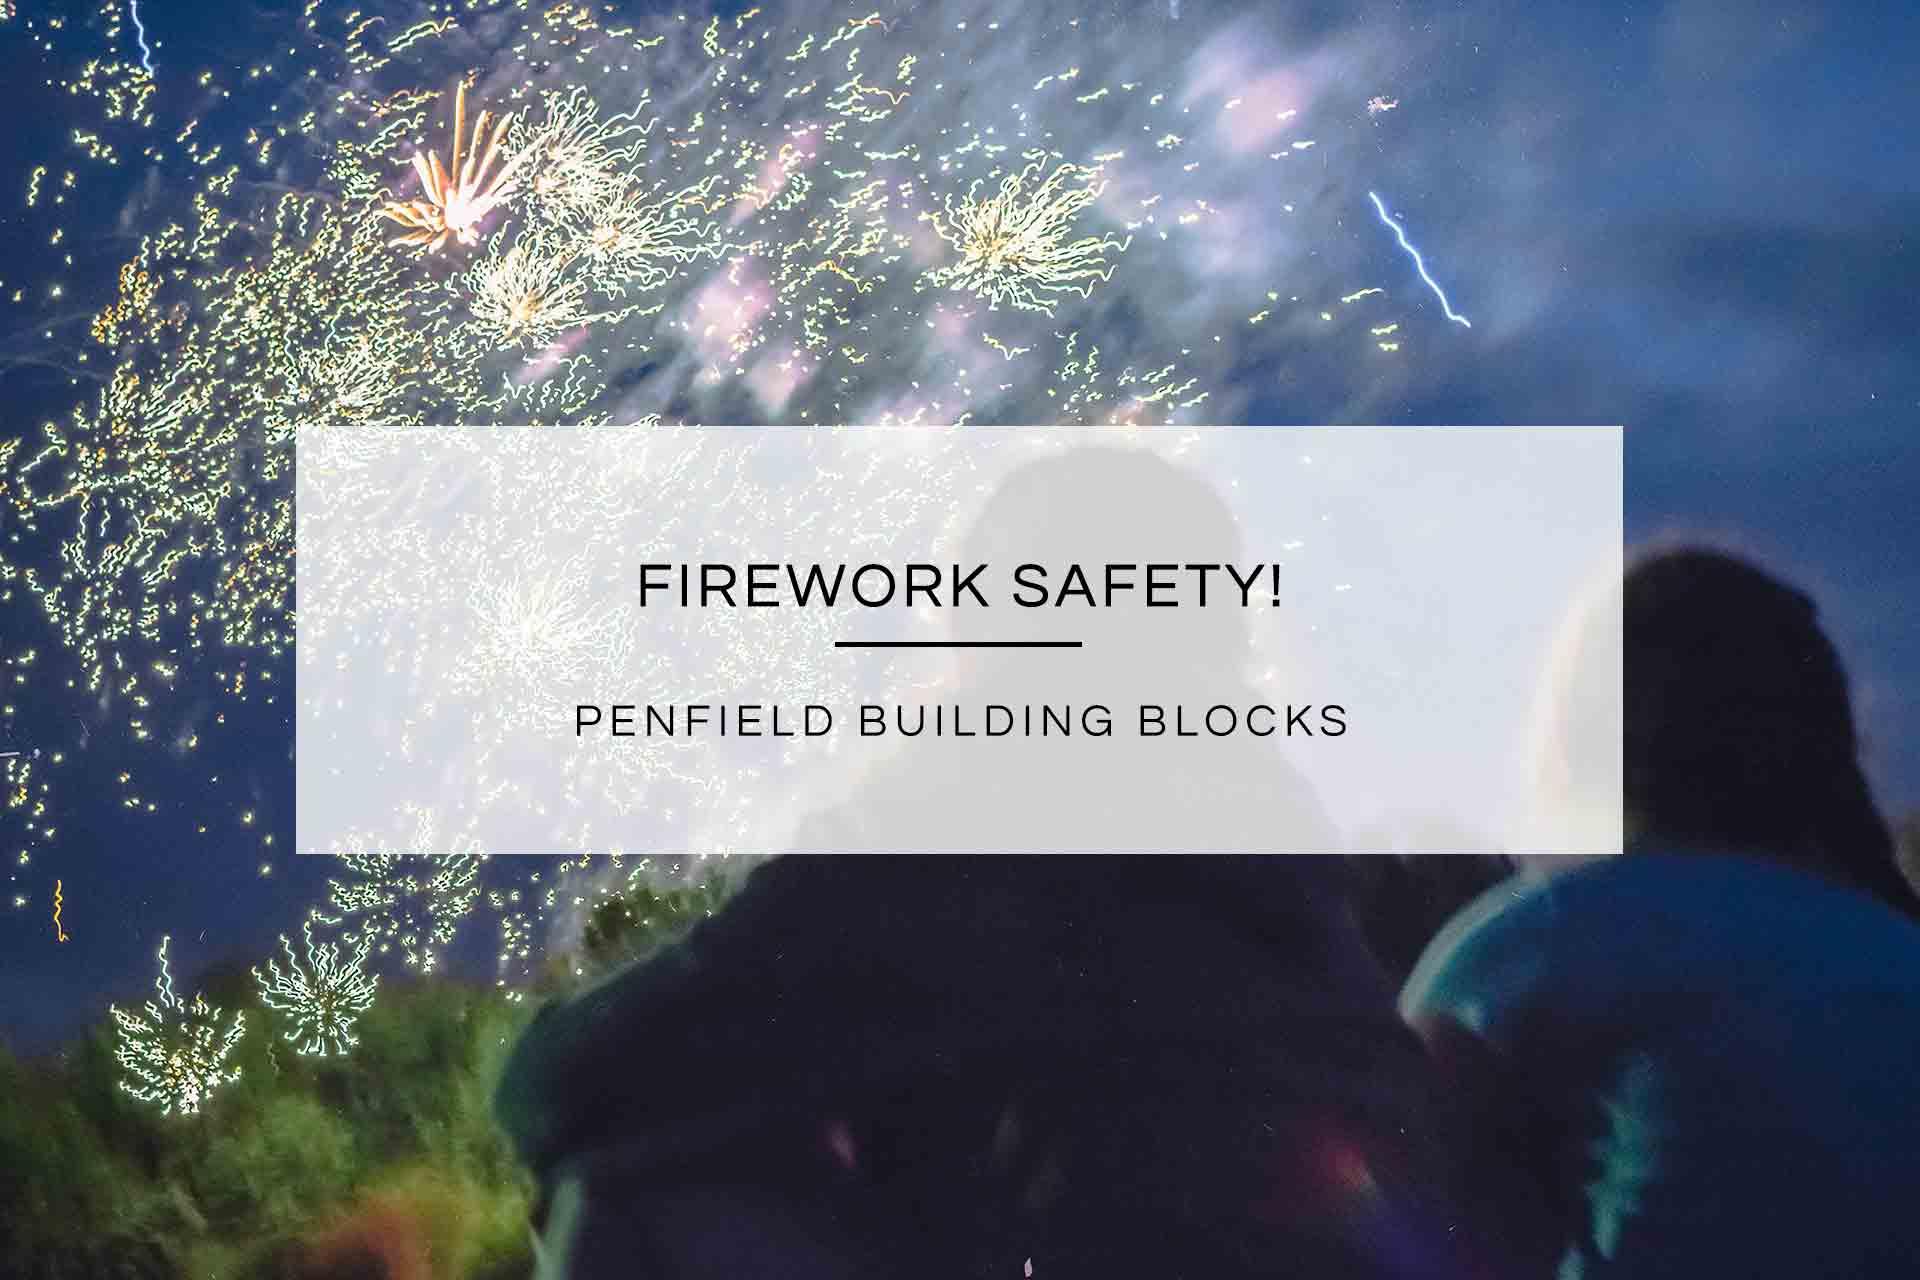 Firework Safety! | Penfield Building Blocks